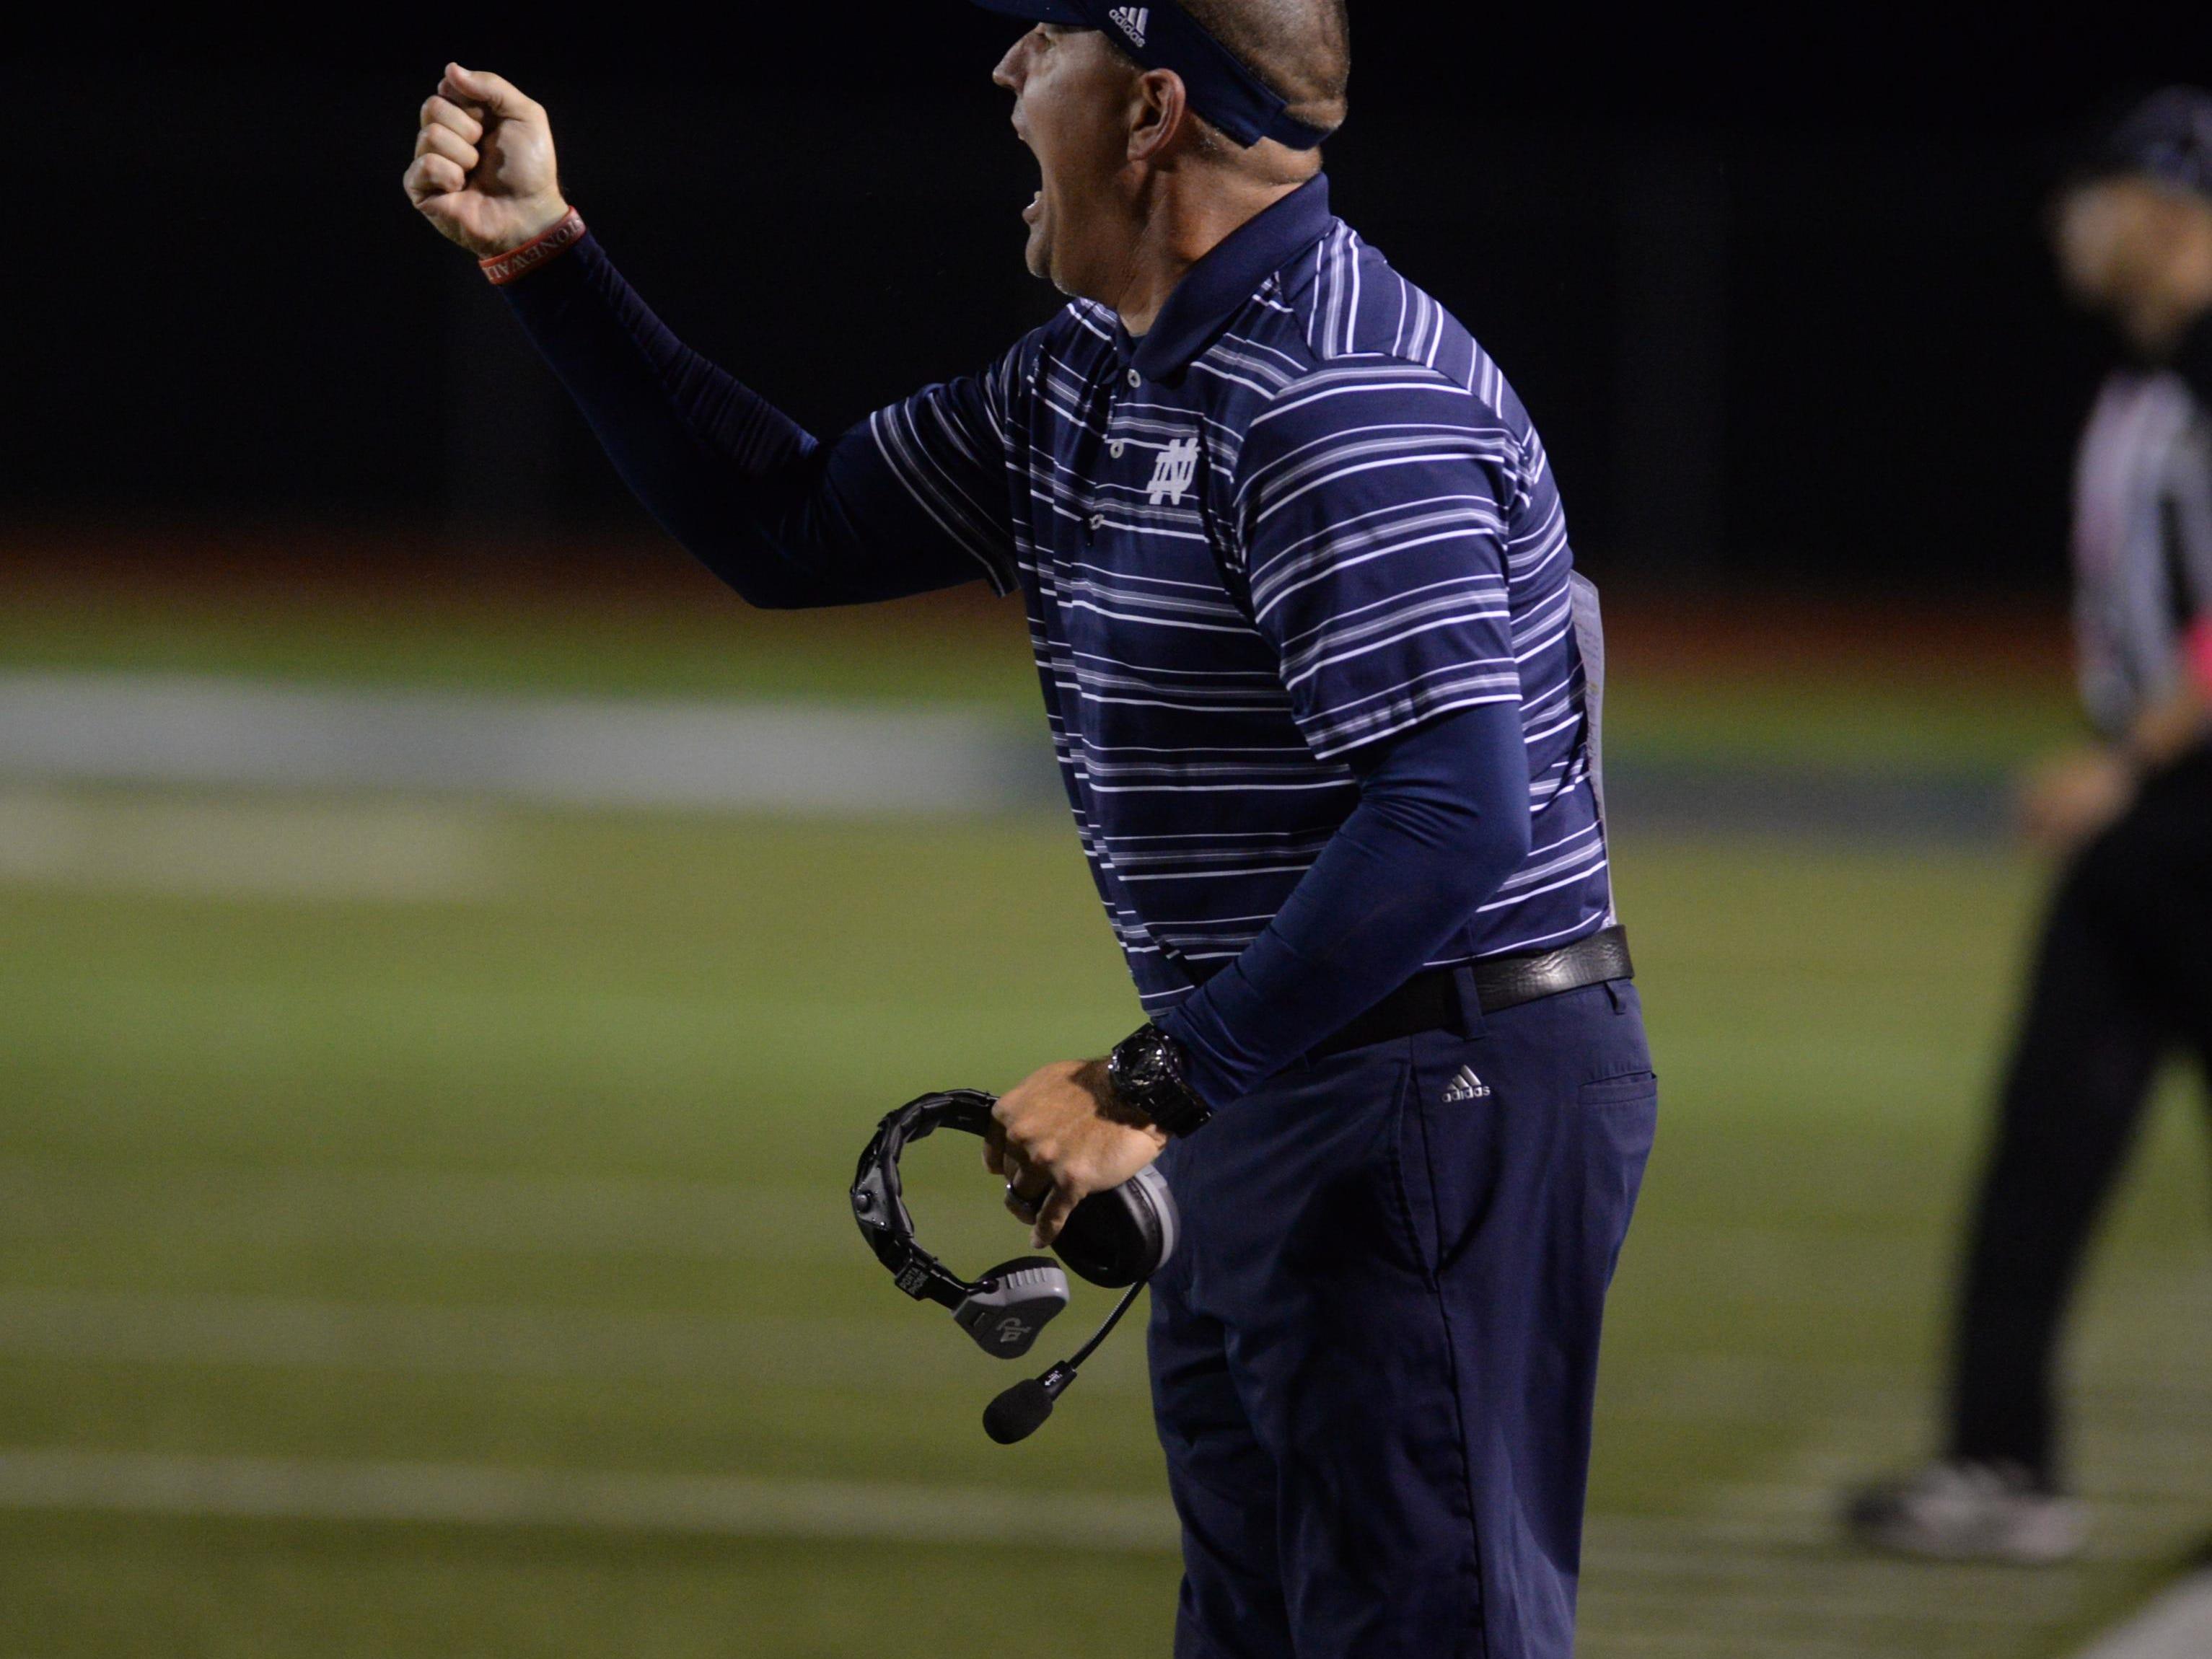 North DeSoto head coach Scott Abernathy yells to his players during their game against Minden.